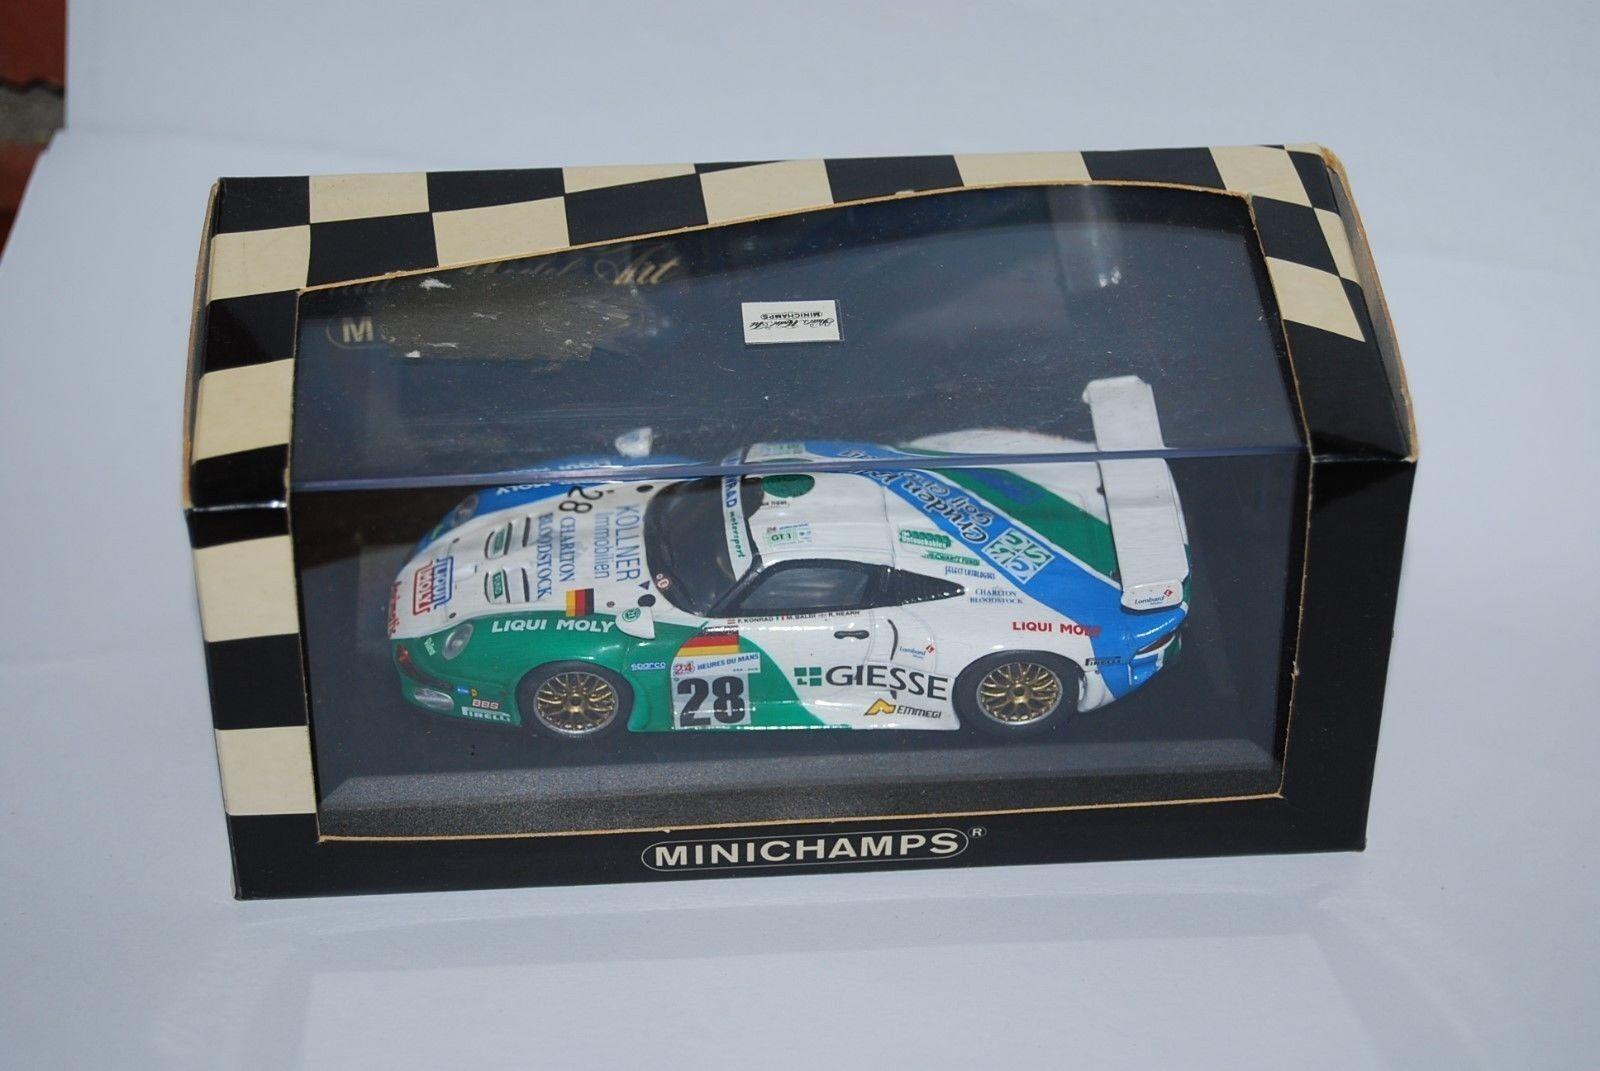 MINICHAMPS MINICHAMPS MINICHAMPS PORSCHE REF 430976628 RARE NEUF BOITE NEW BOX 1 43 c1d881